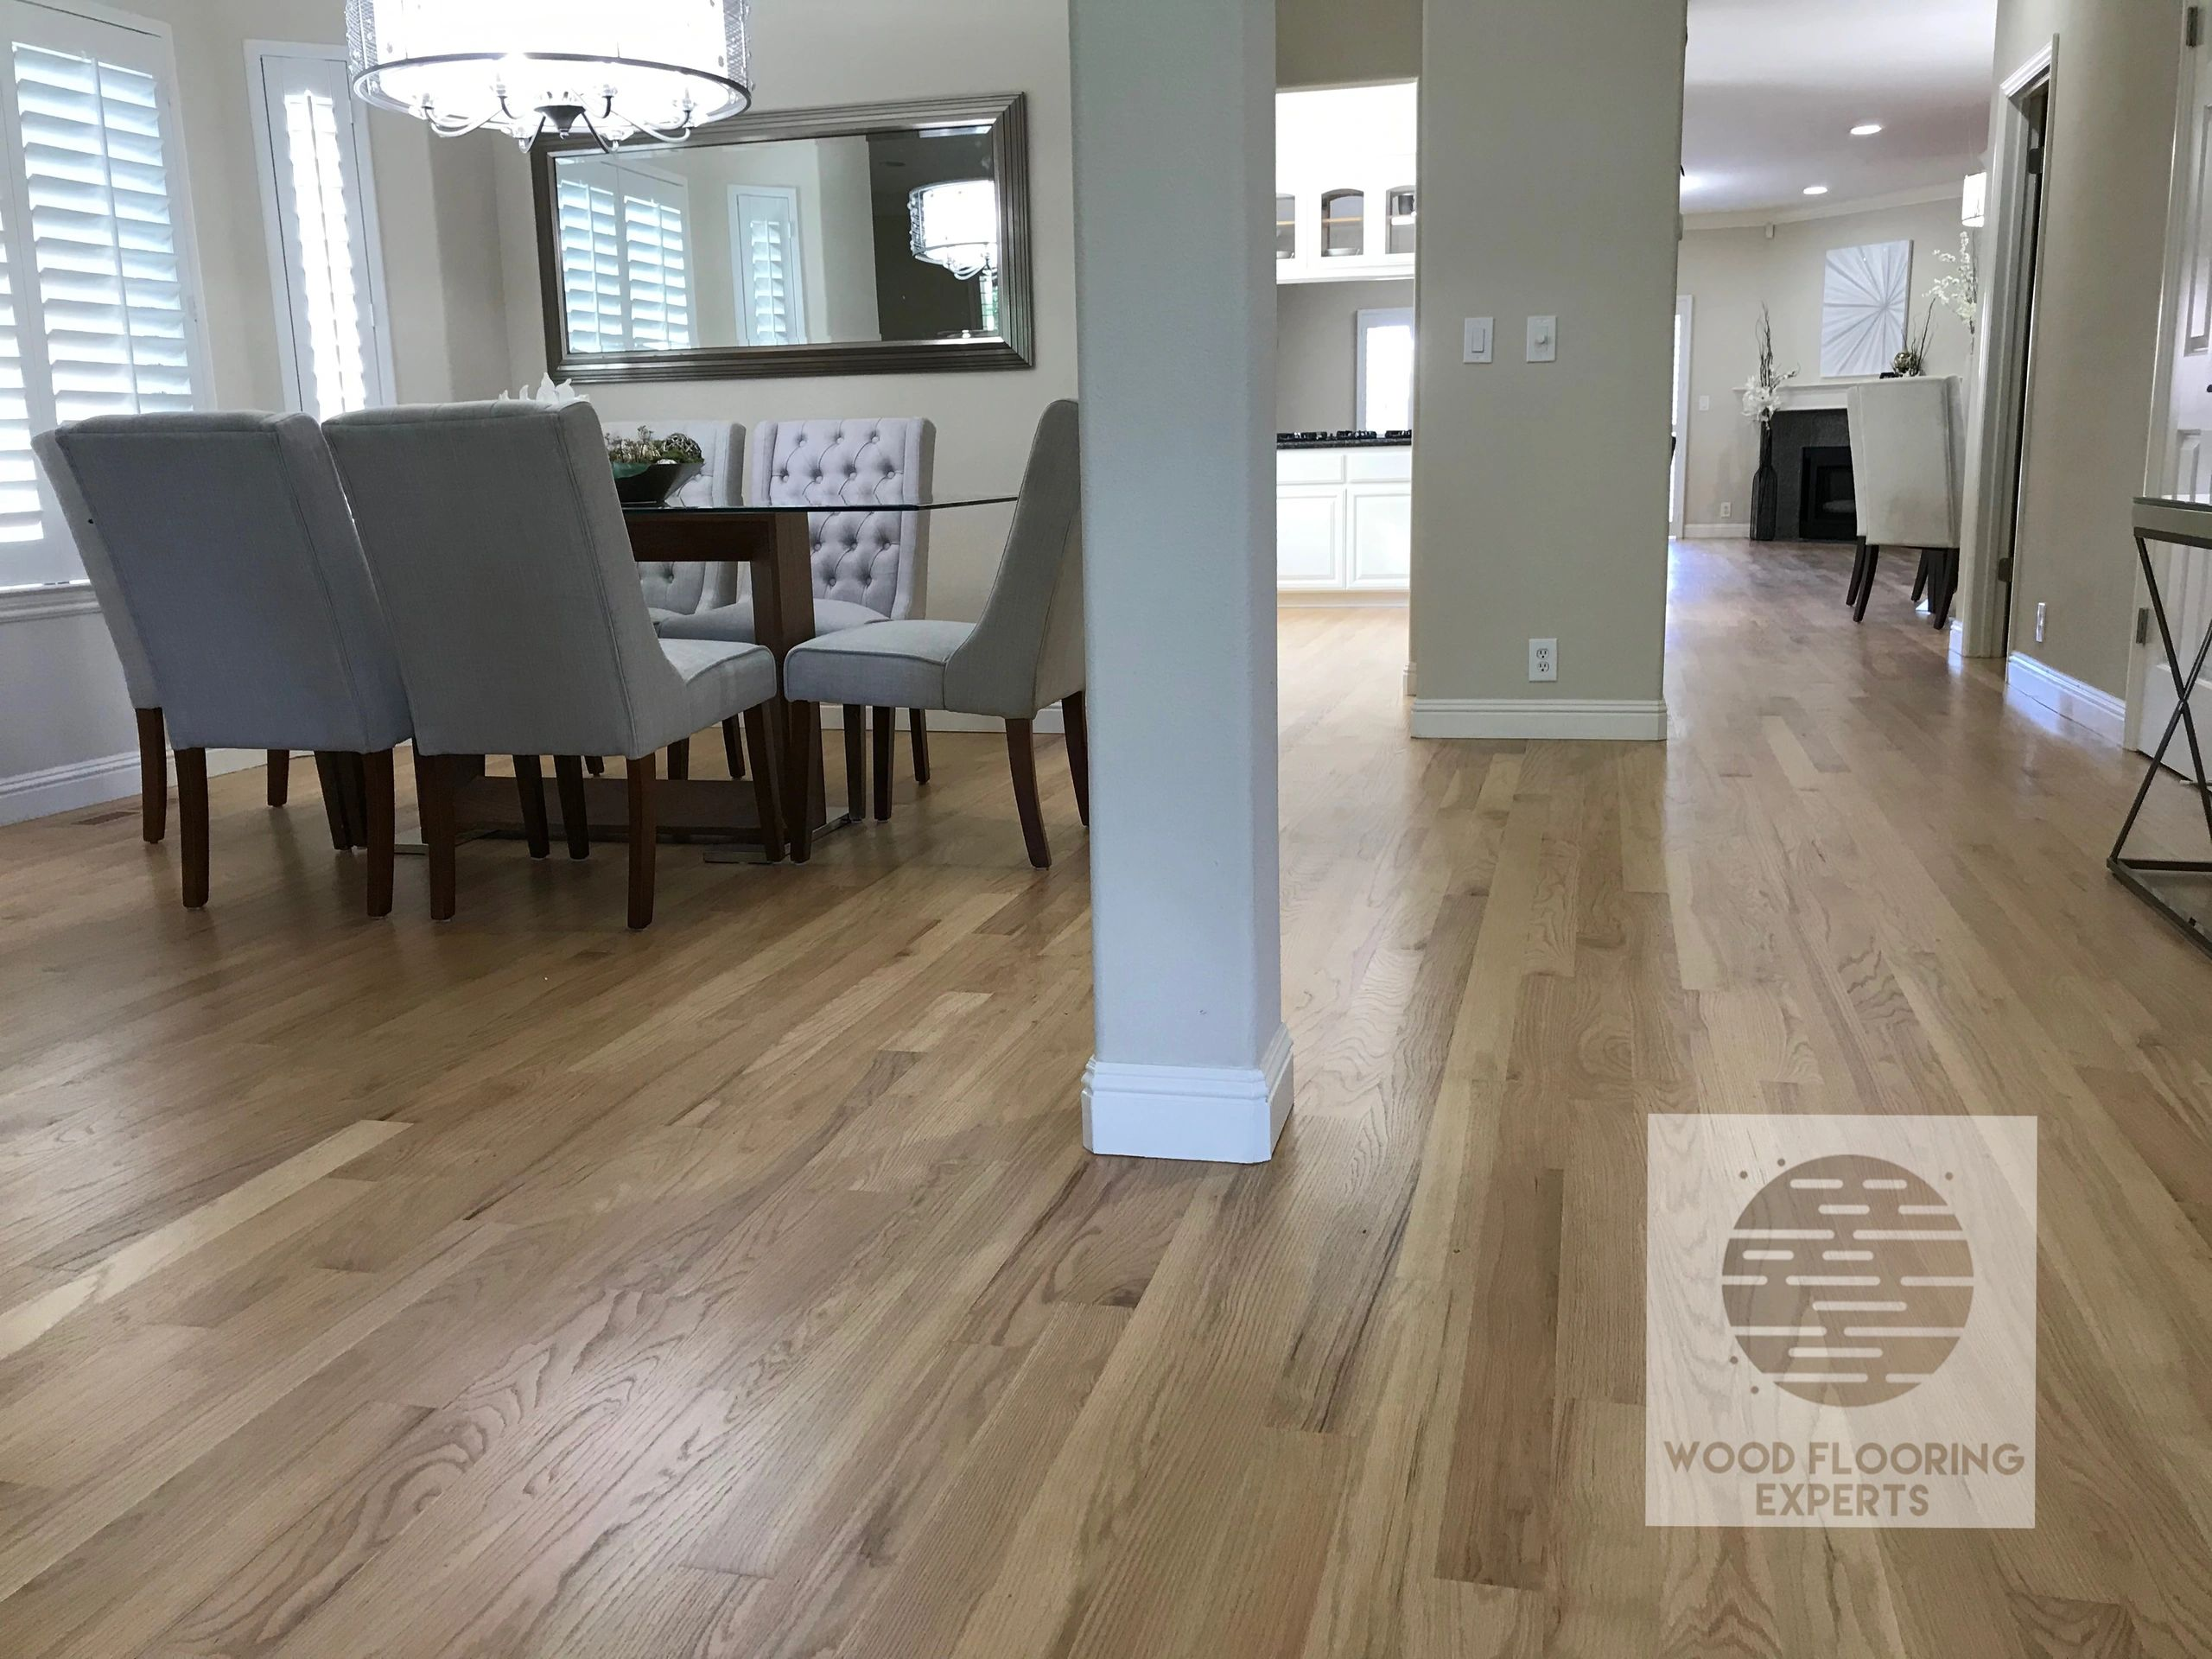 Wood Flooring Experts